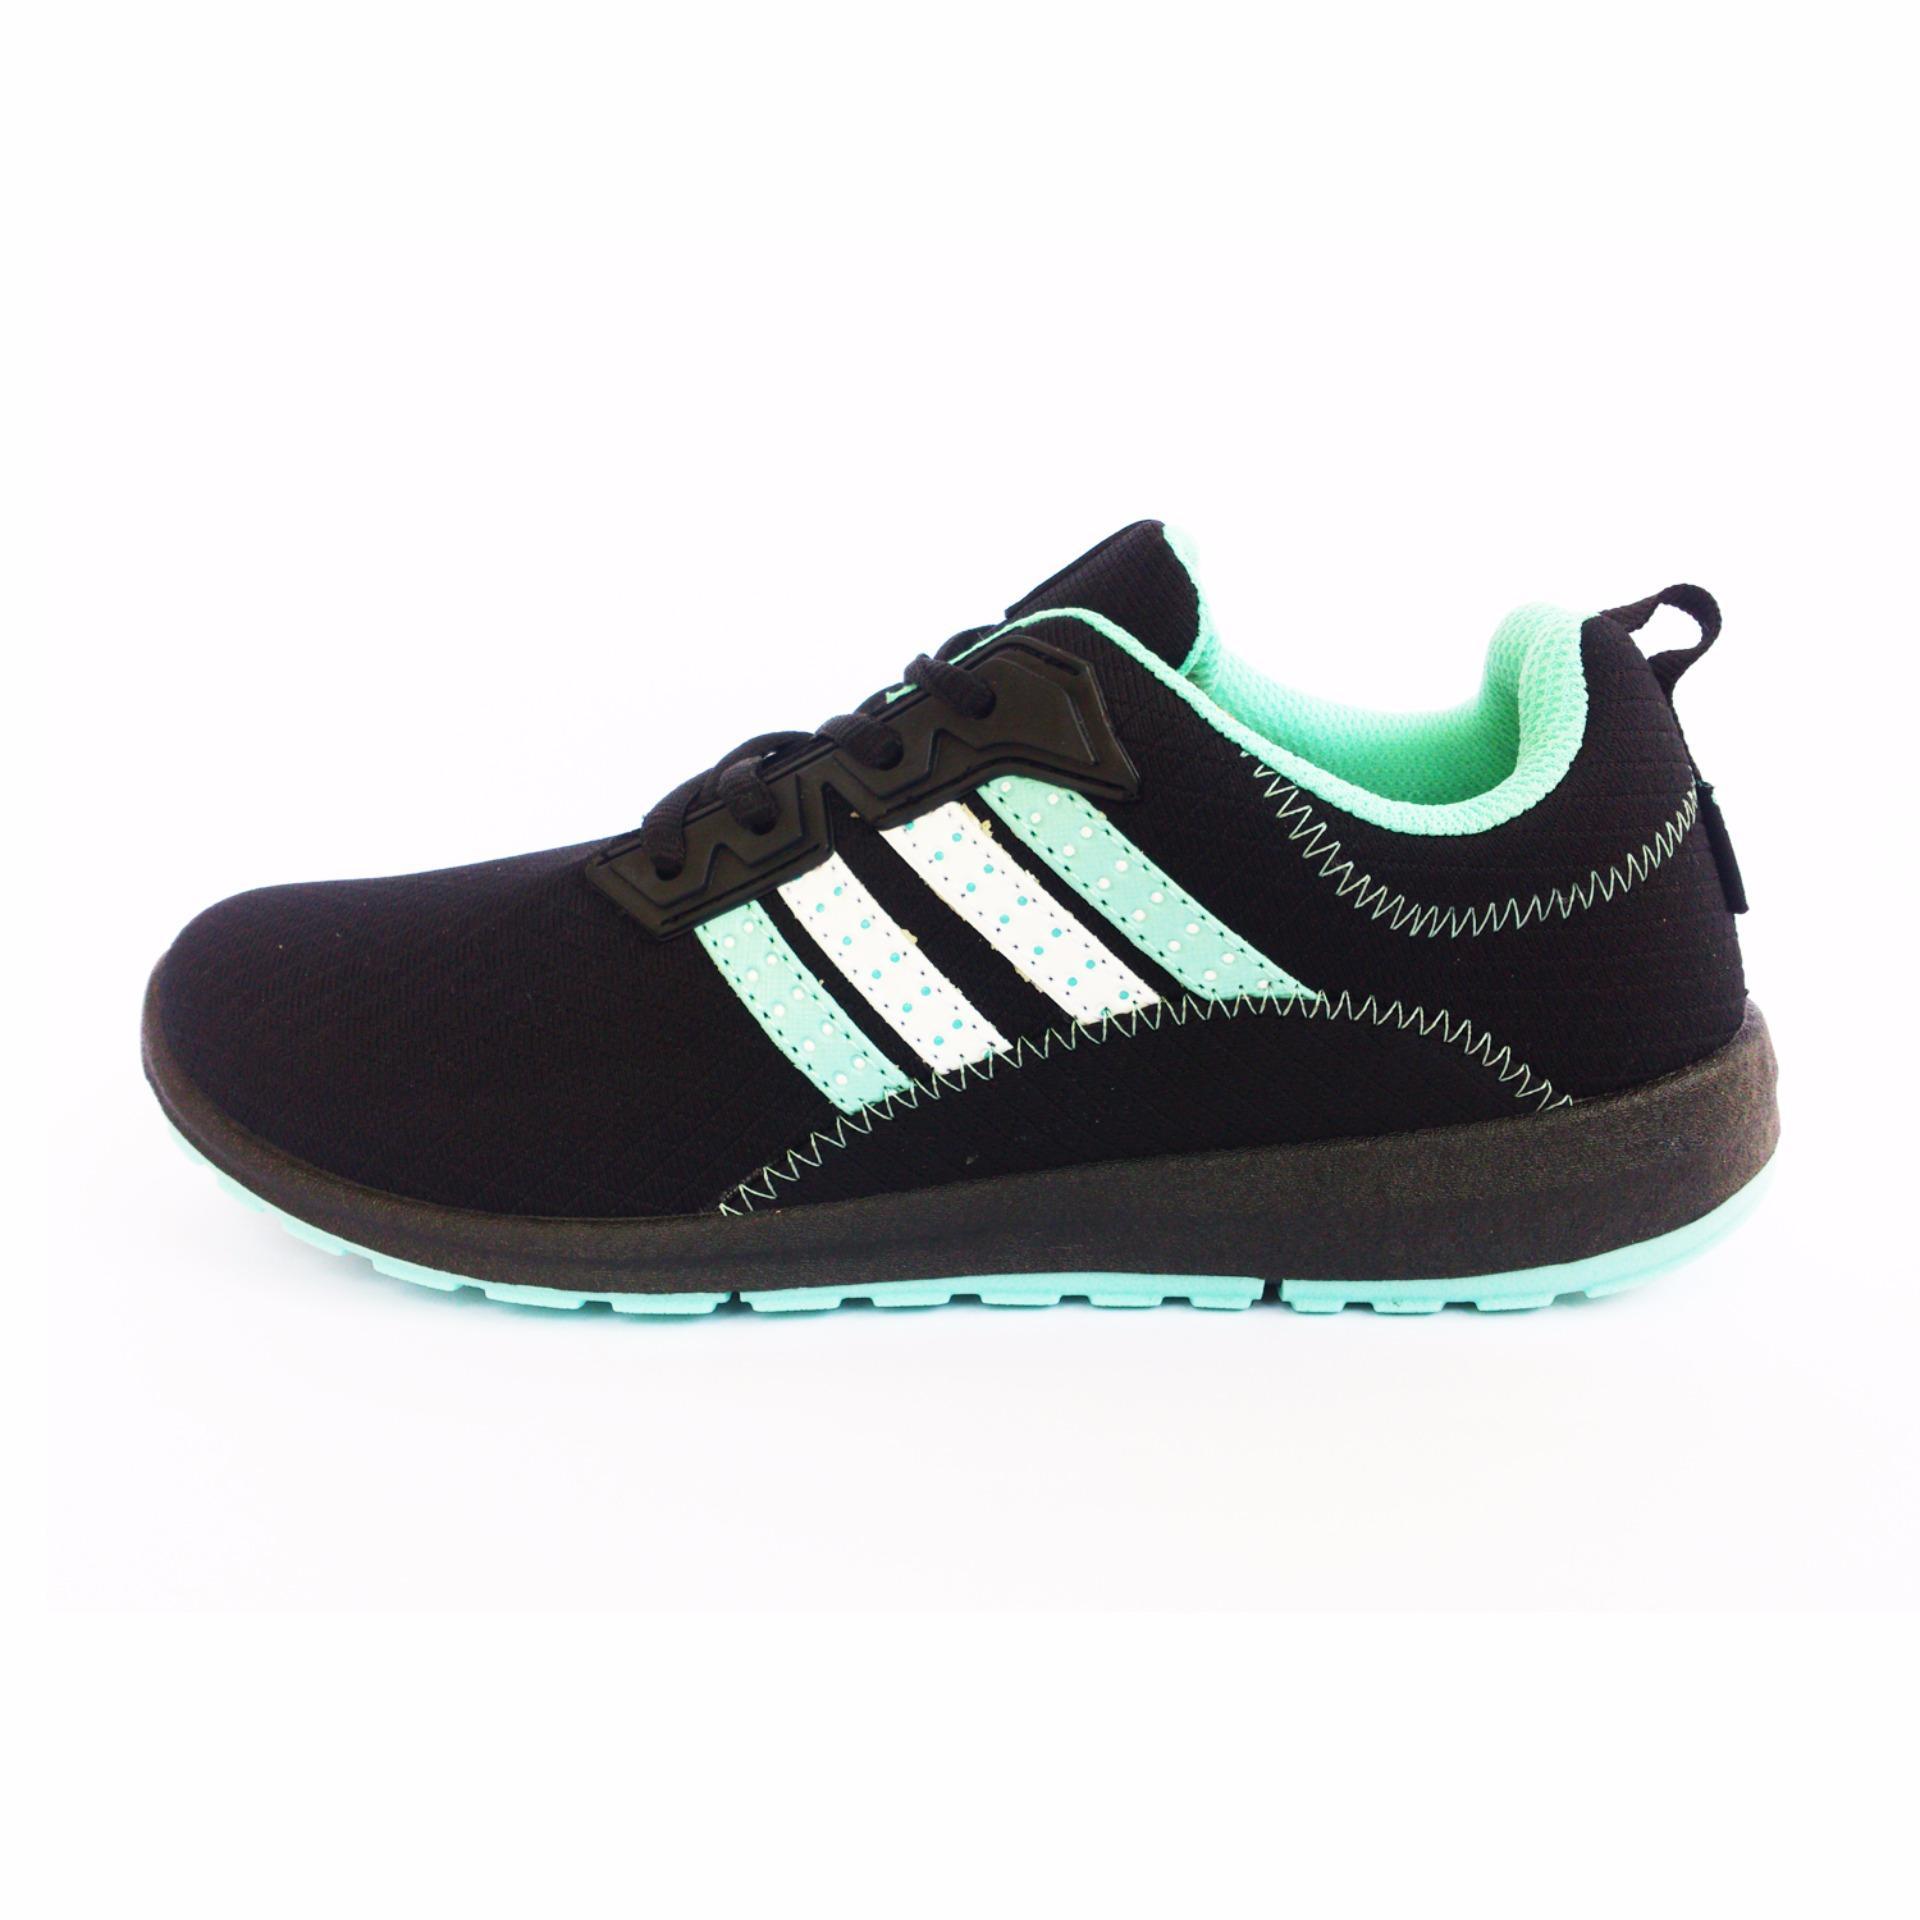 Spesifikasi Ando Plano Sepatu Olahraga Wanita Warna Hitam Tosca